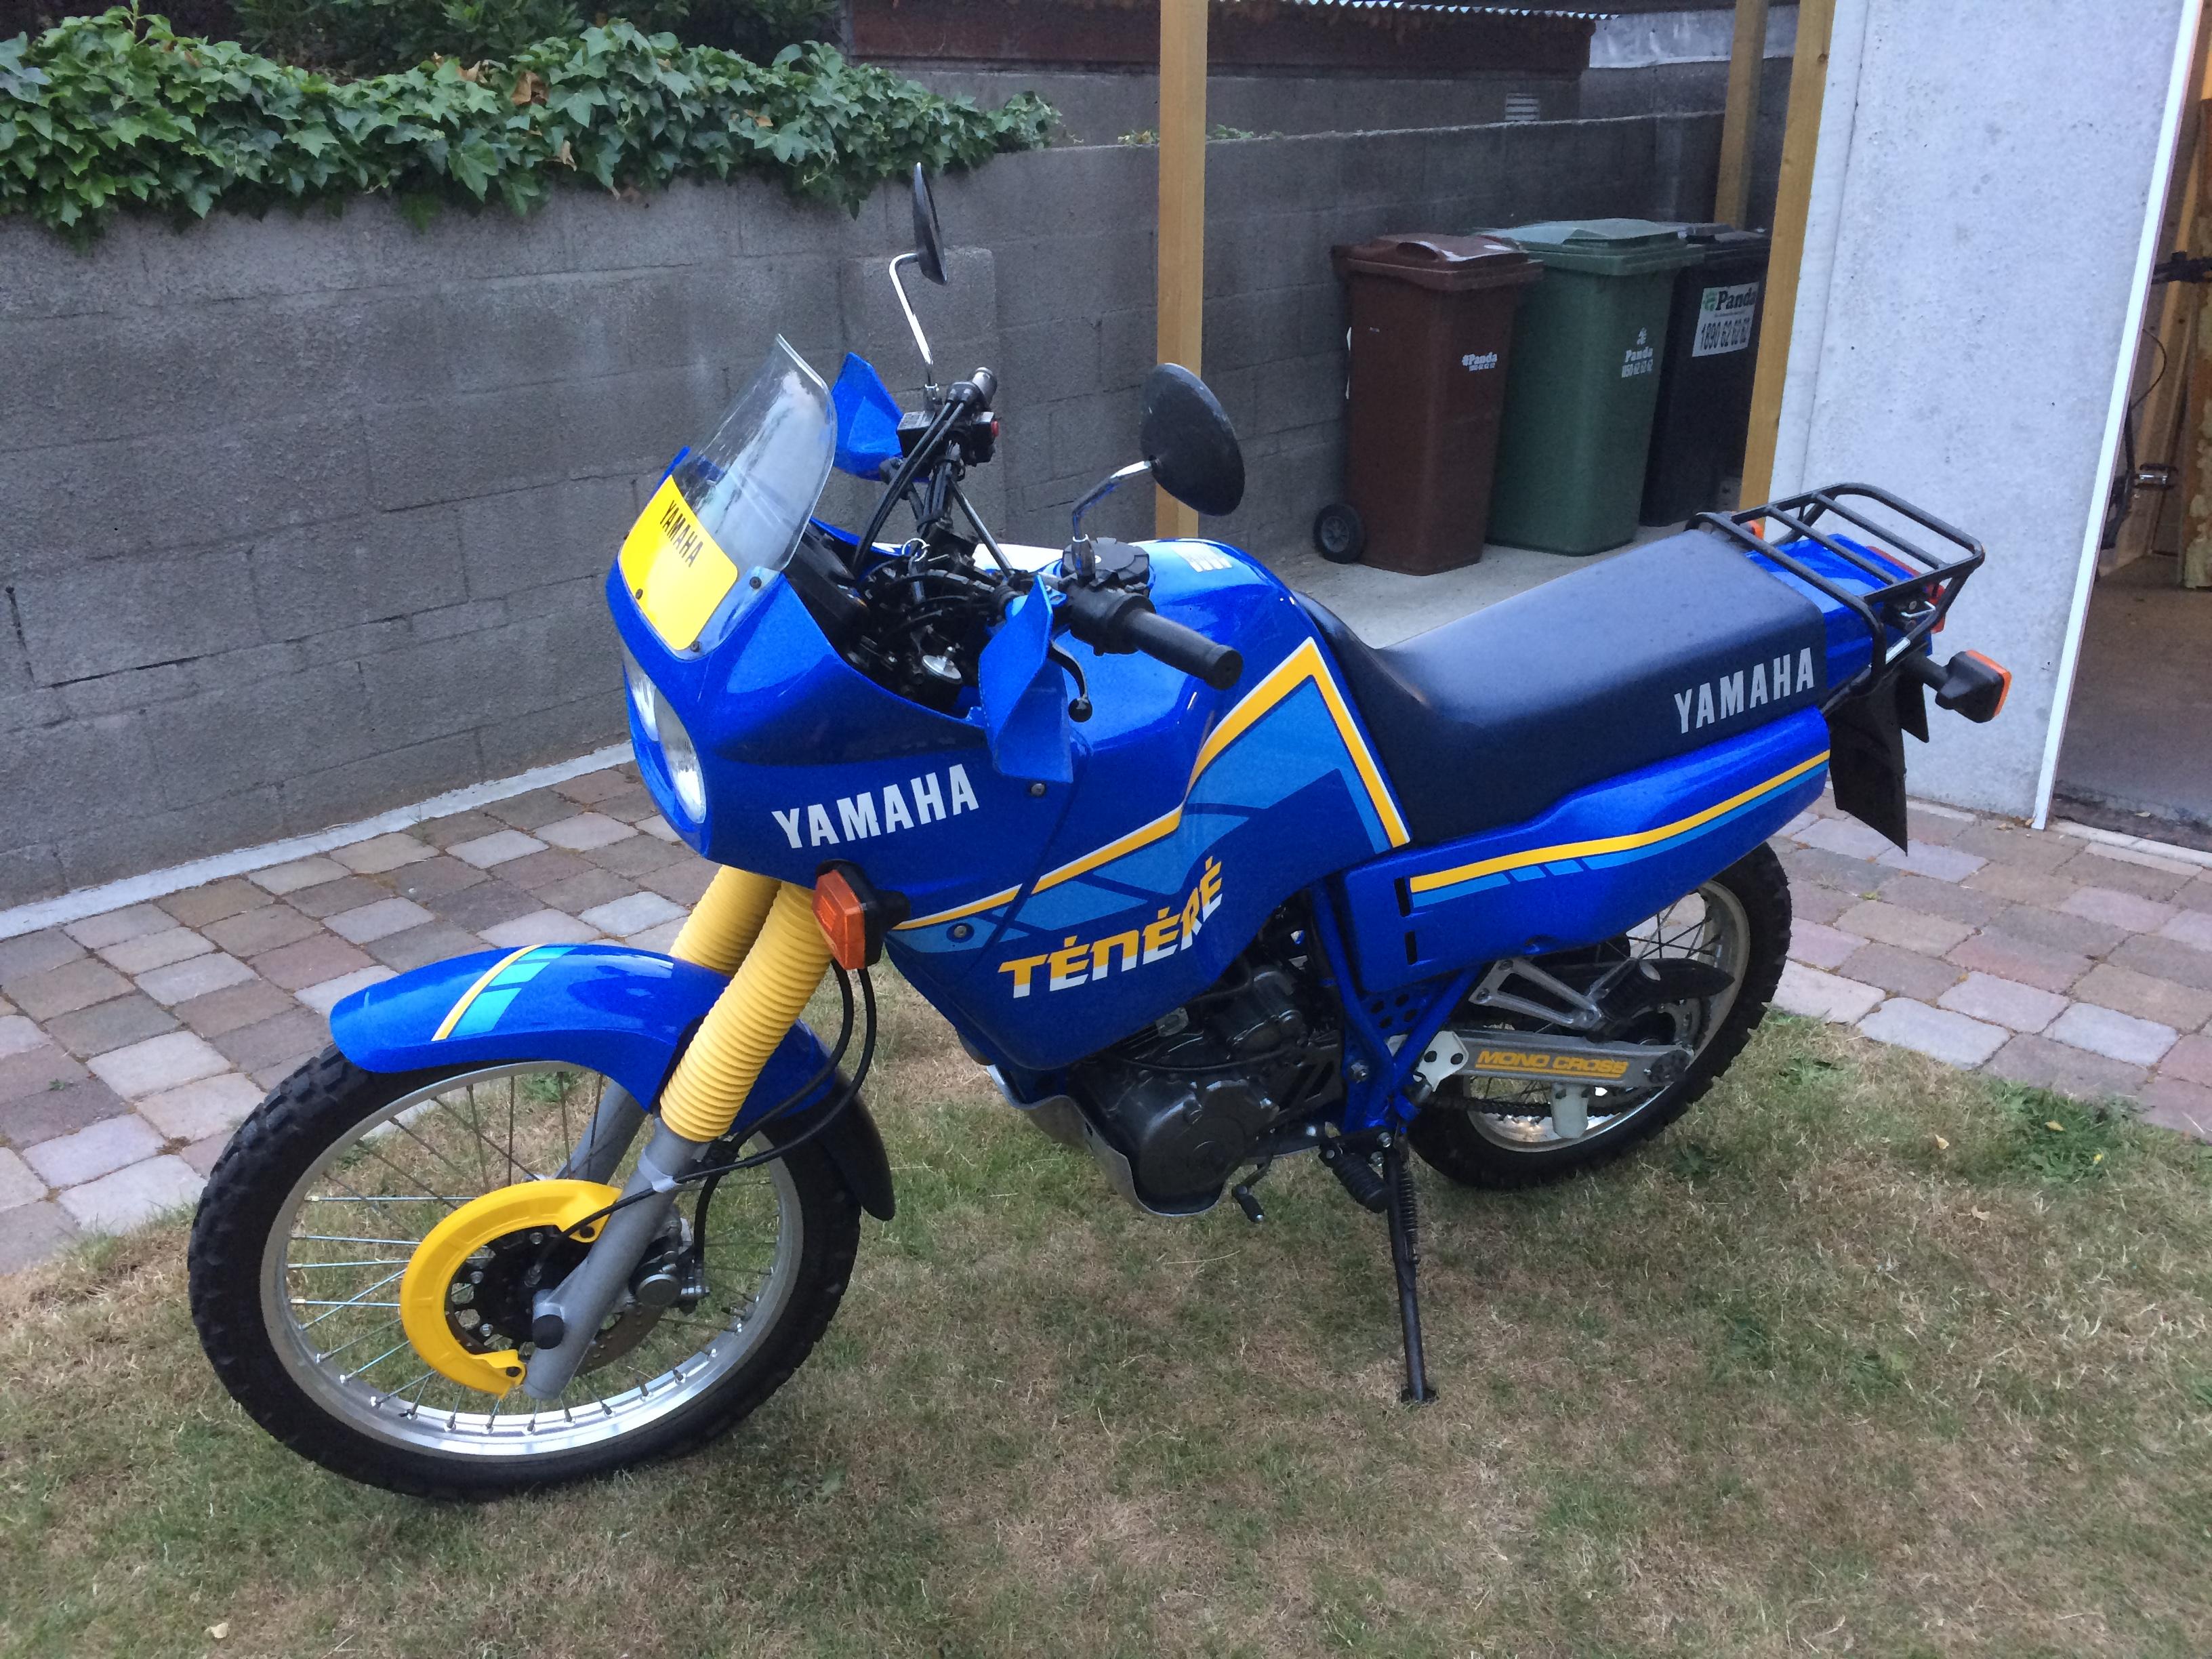 Original low km's Yamaha 3AJ Tenere